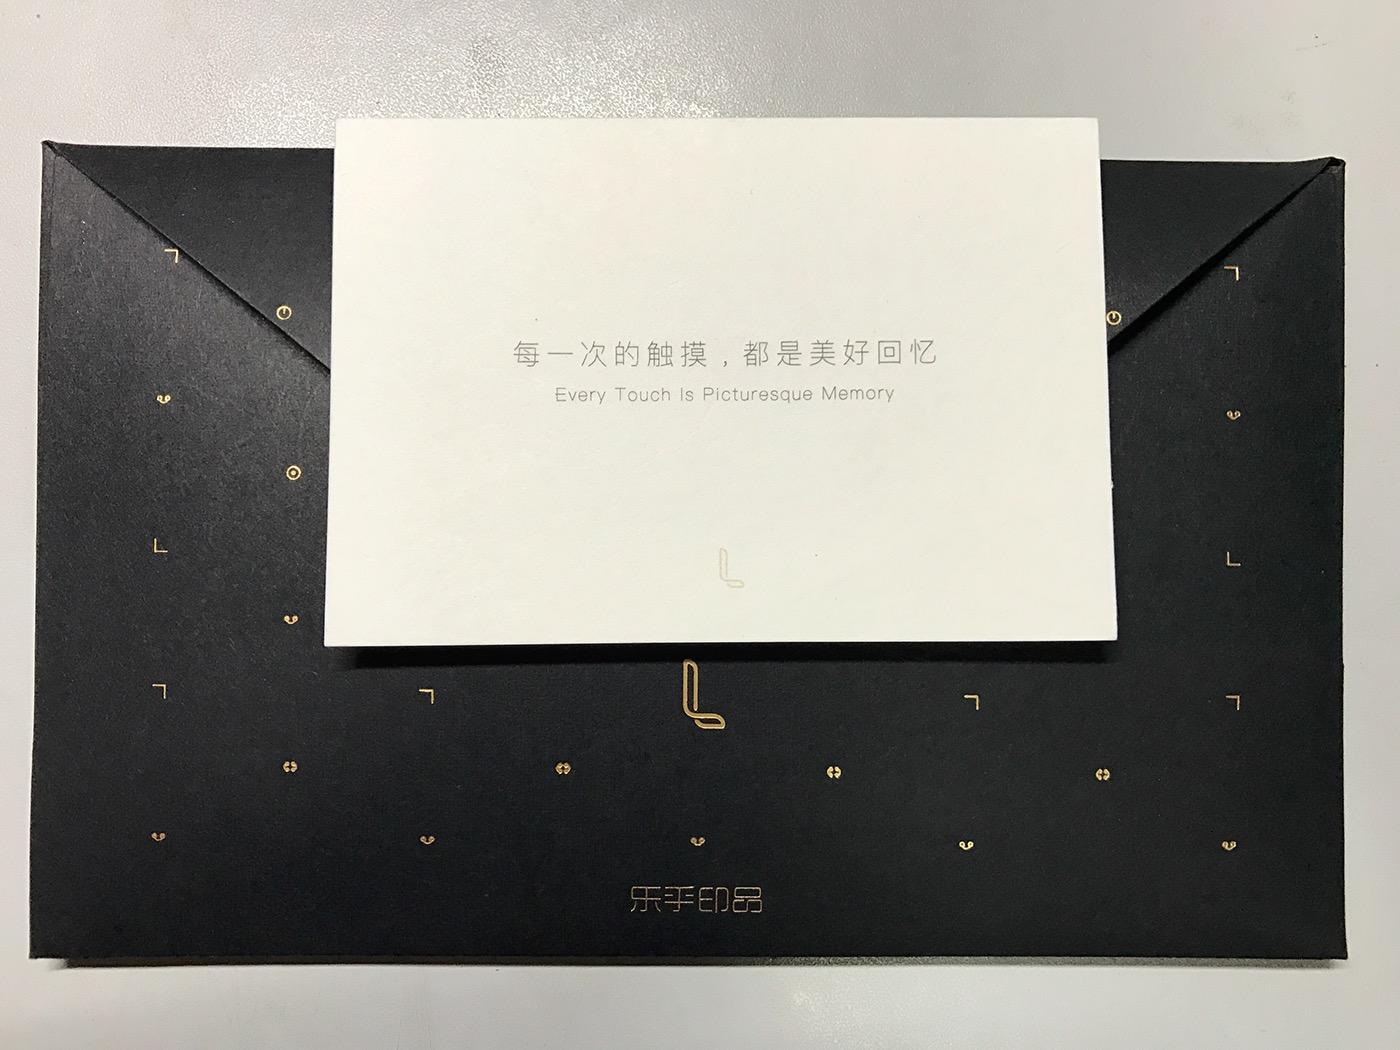 iphone case macaroon mint